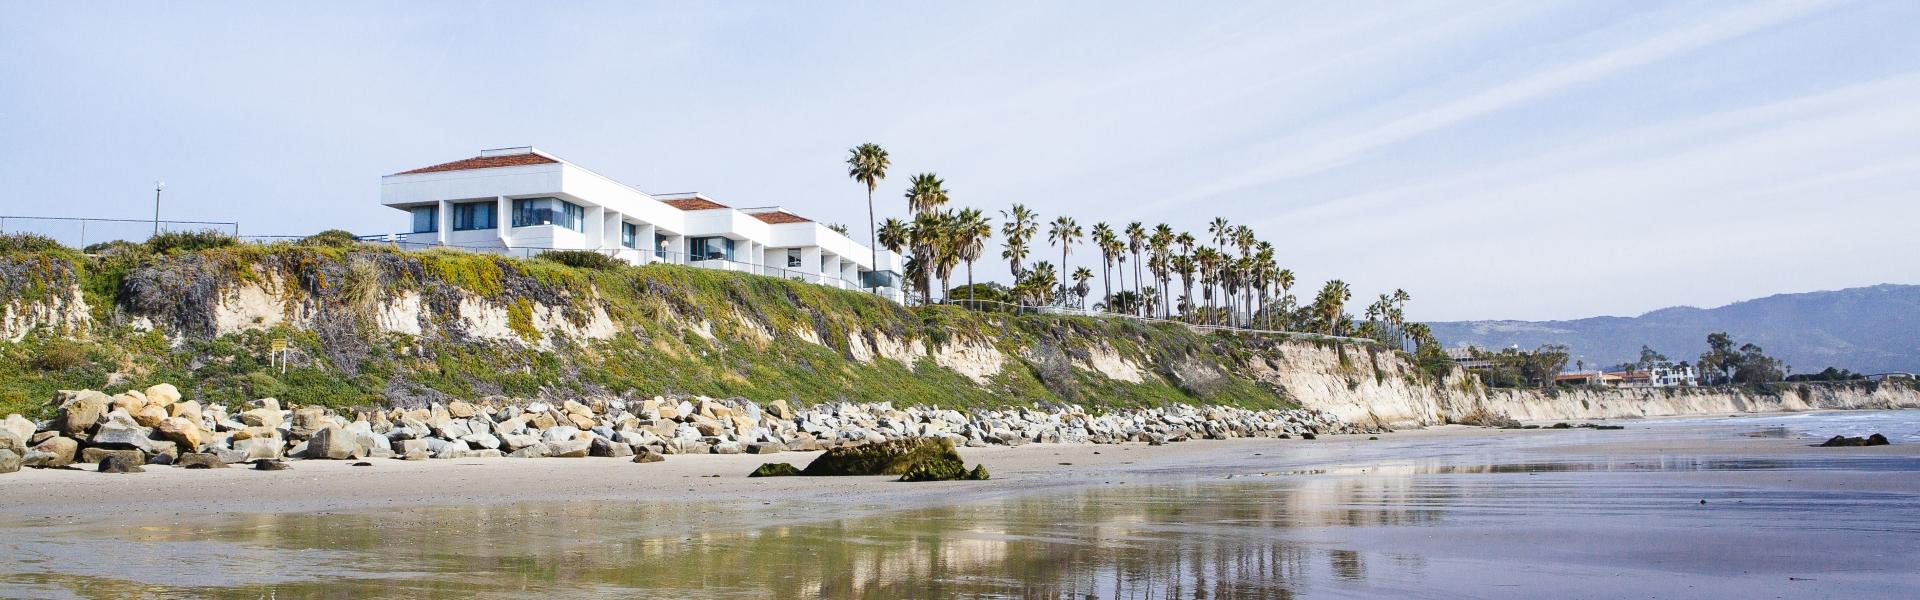 Building on beach cliff